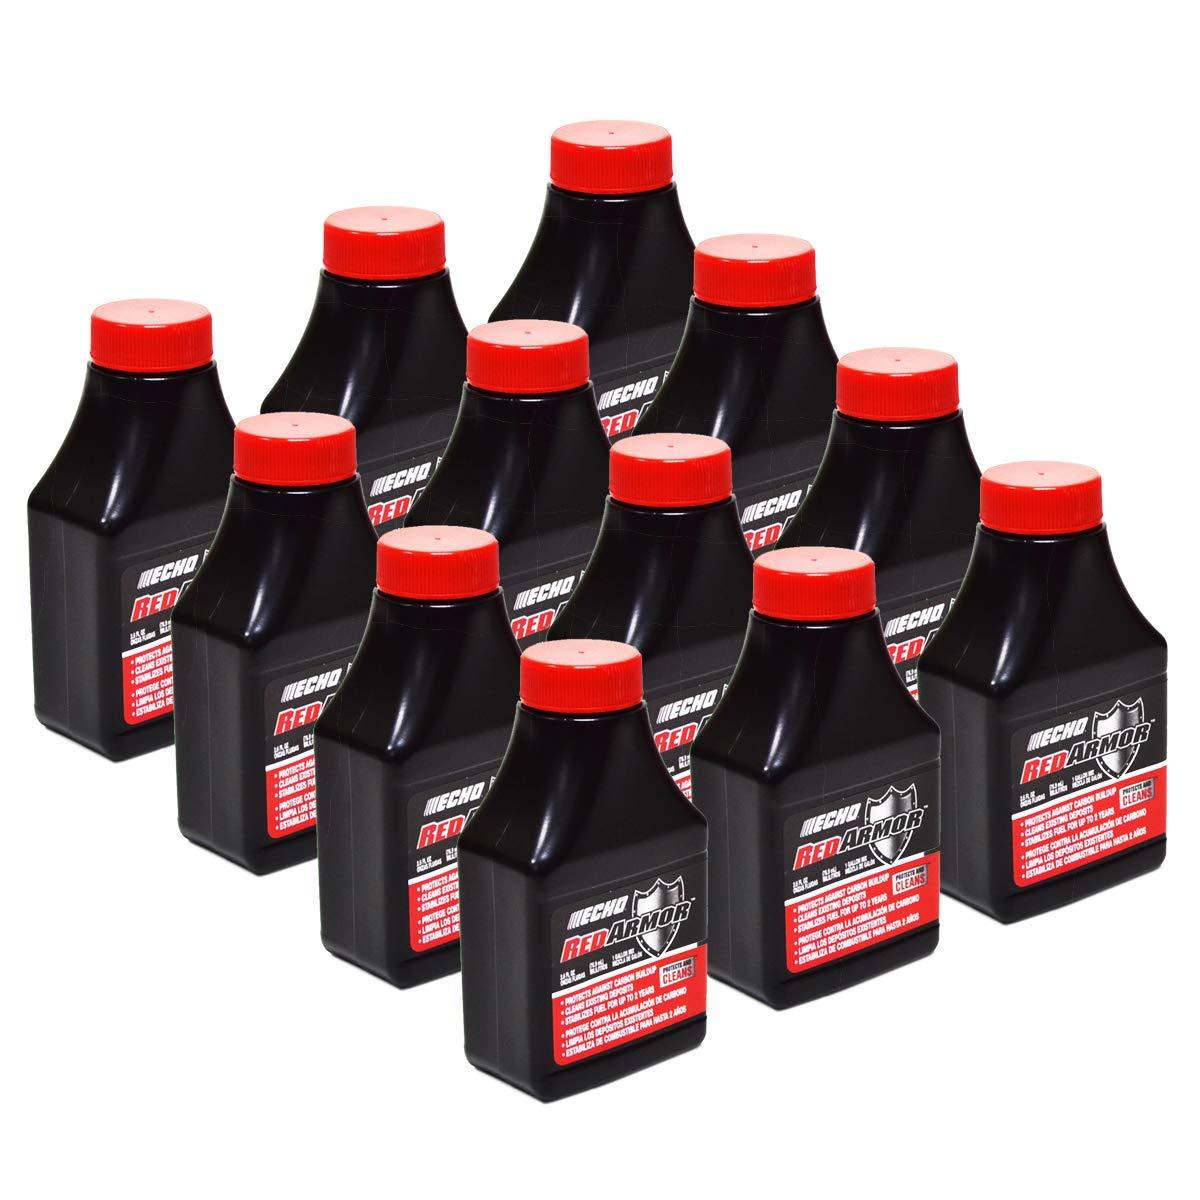 (12) Genuine OEM Echo Red Armor 1 Gallon Mix of 2-Cycle Oil 2.6oz 2.6 oz 6550000